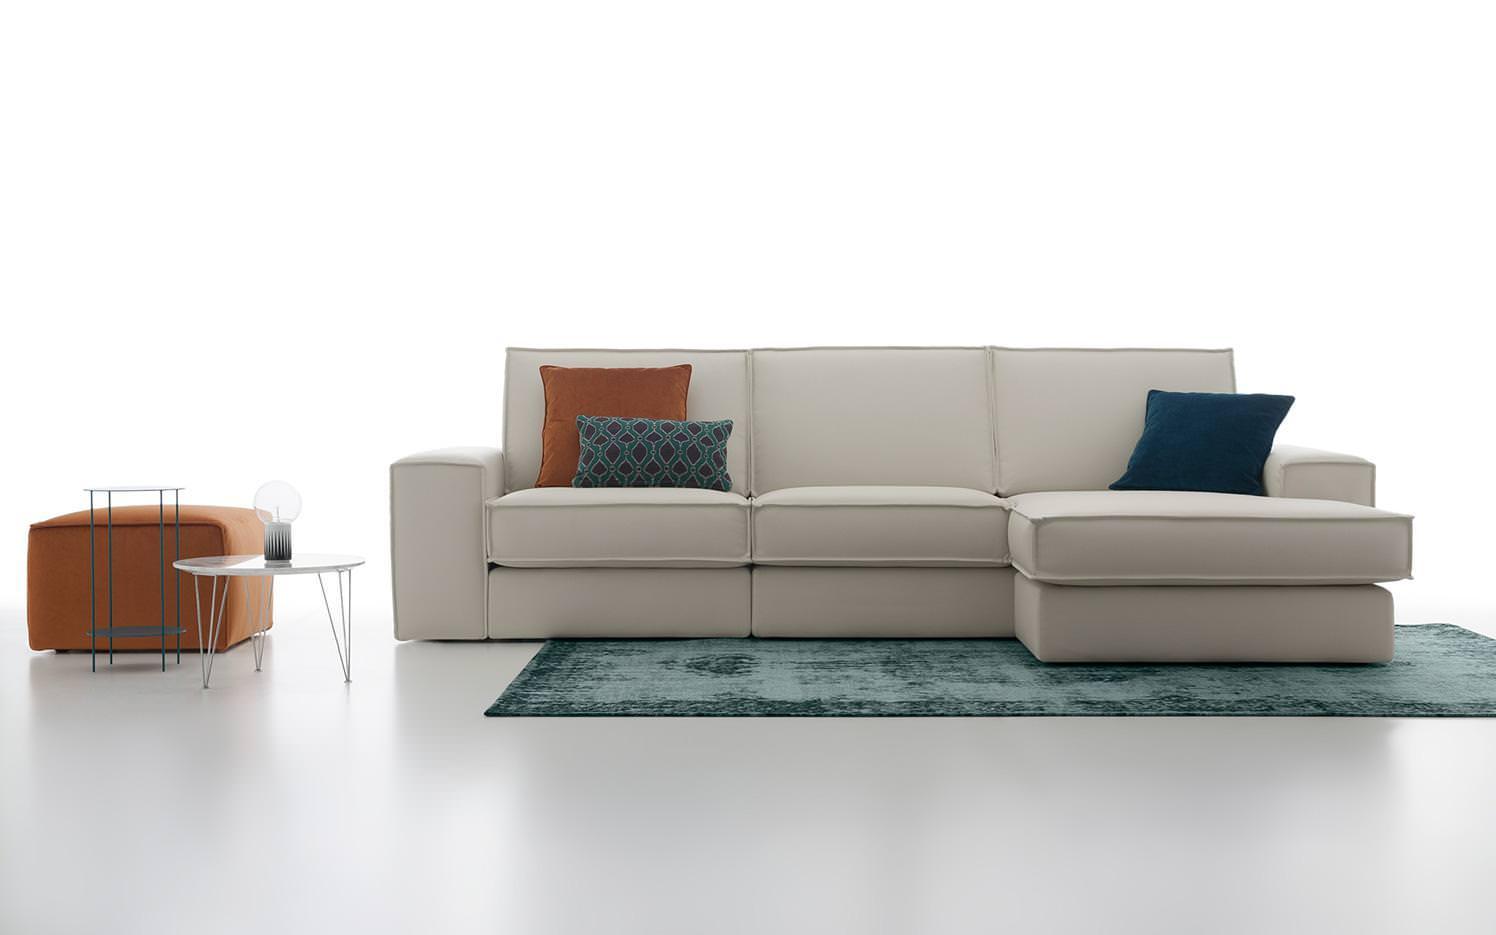 Hogan divani moderni e di design felis for Bf arredamenti